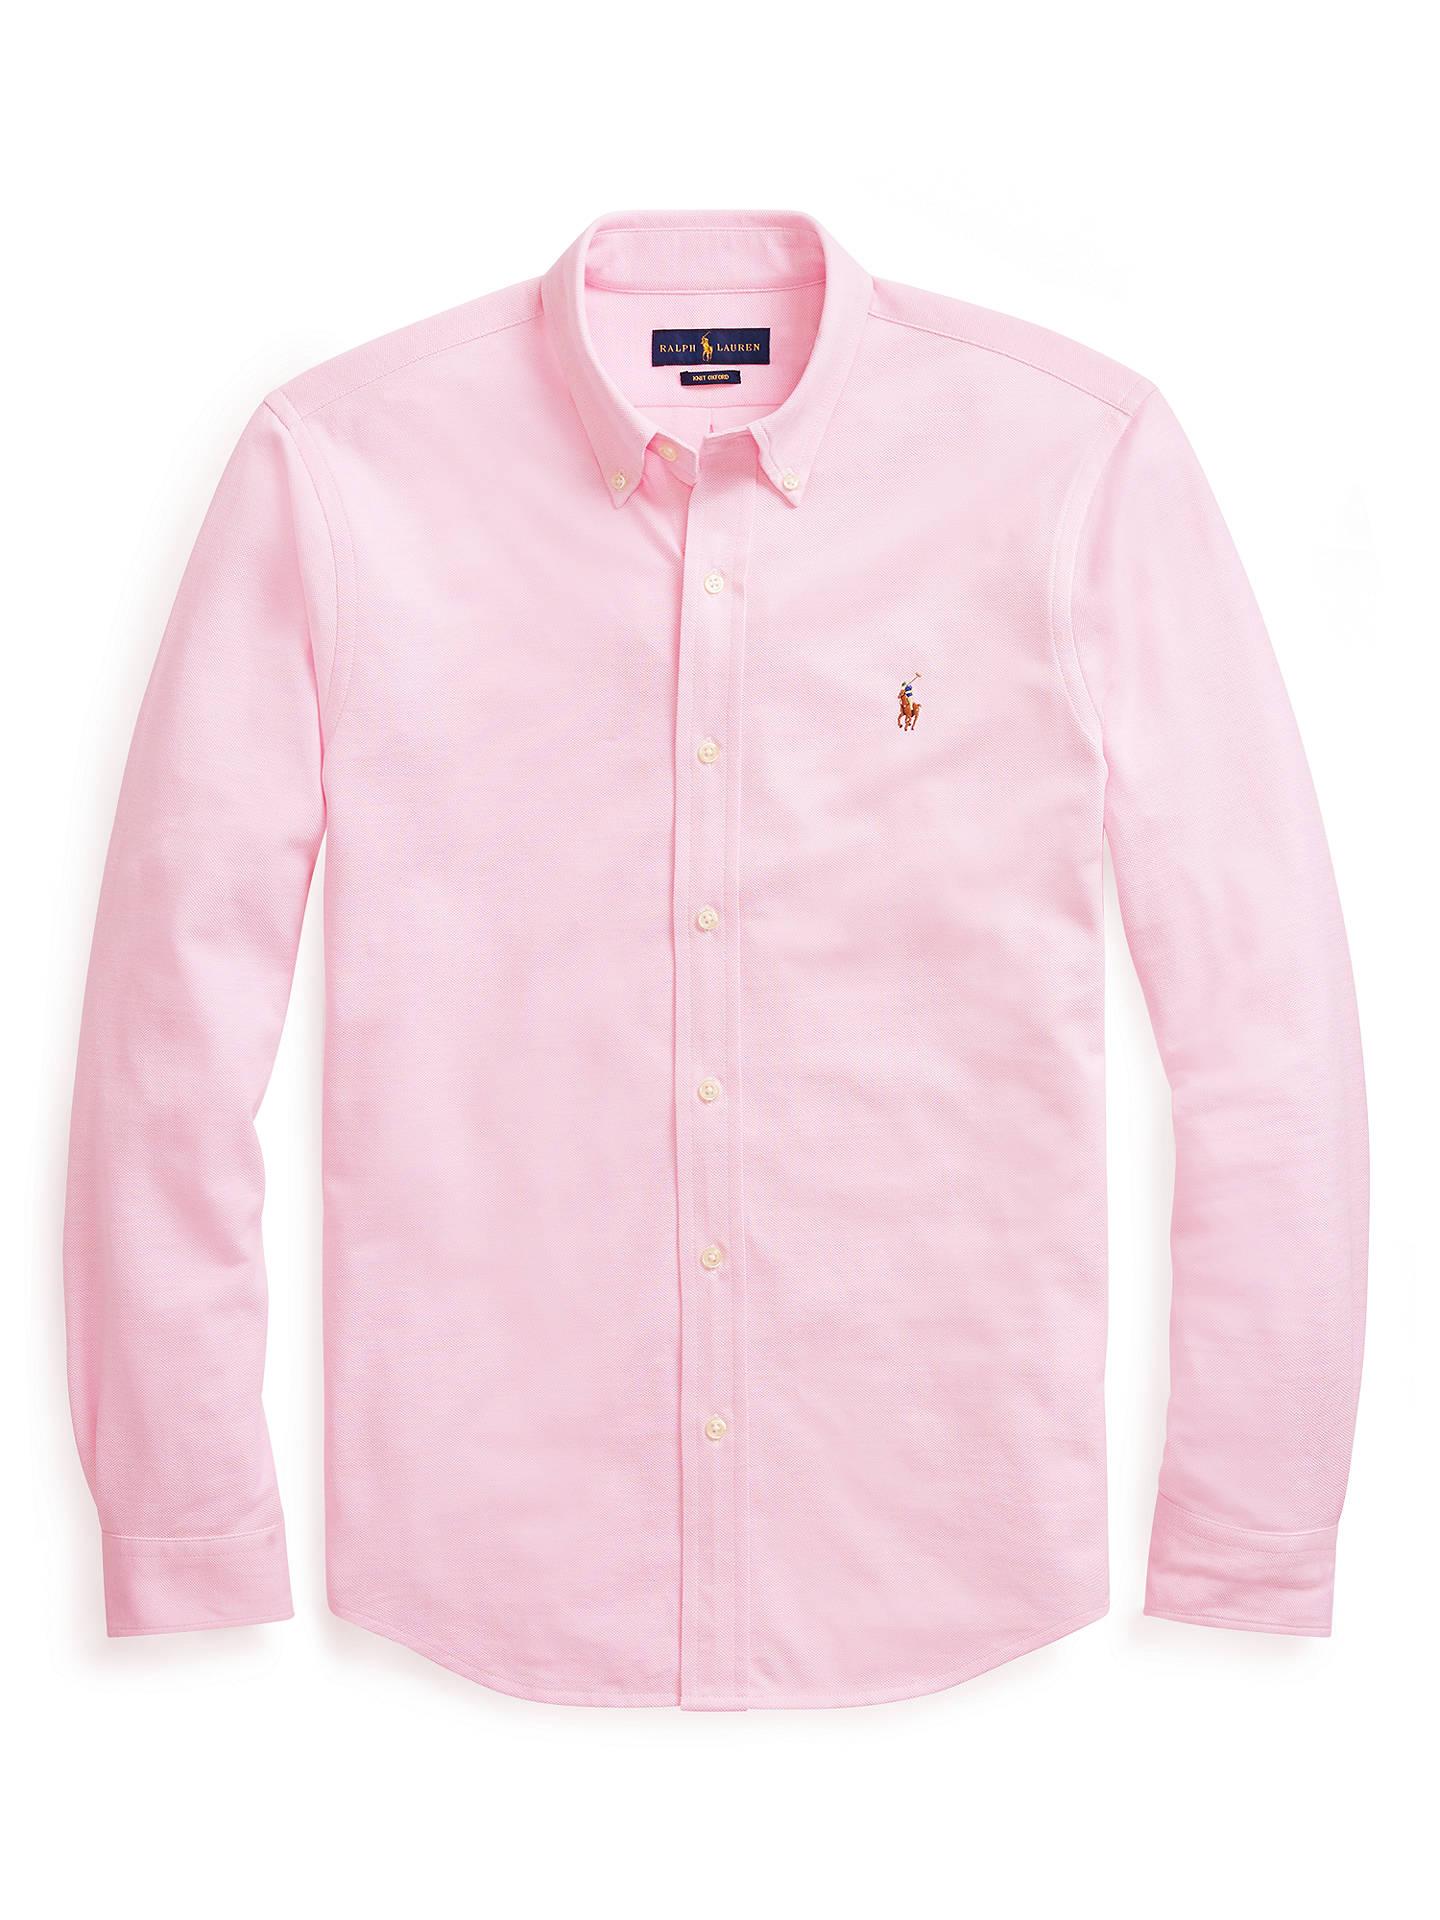 fc0cbfa57ab81 Polo Ralph Lauren Custom Fit Oxford Shirt at John Lewis   Partners